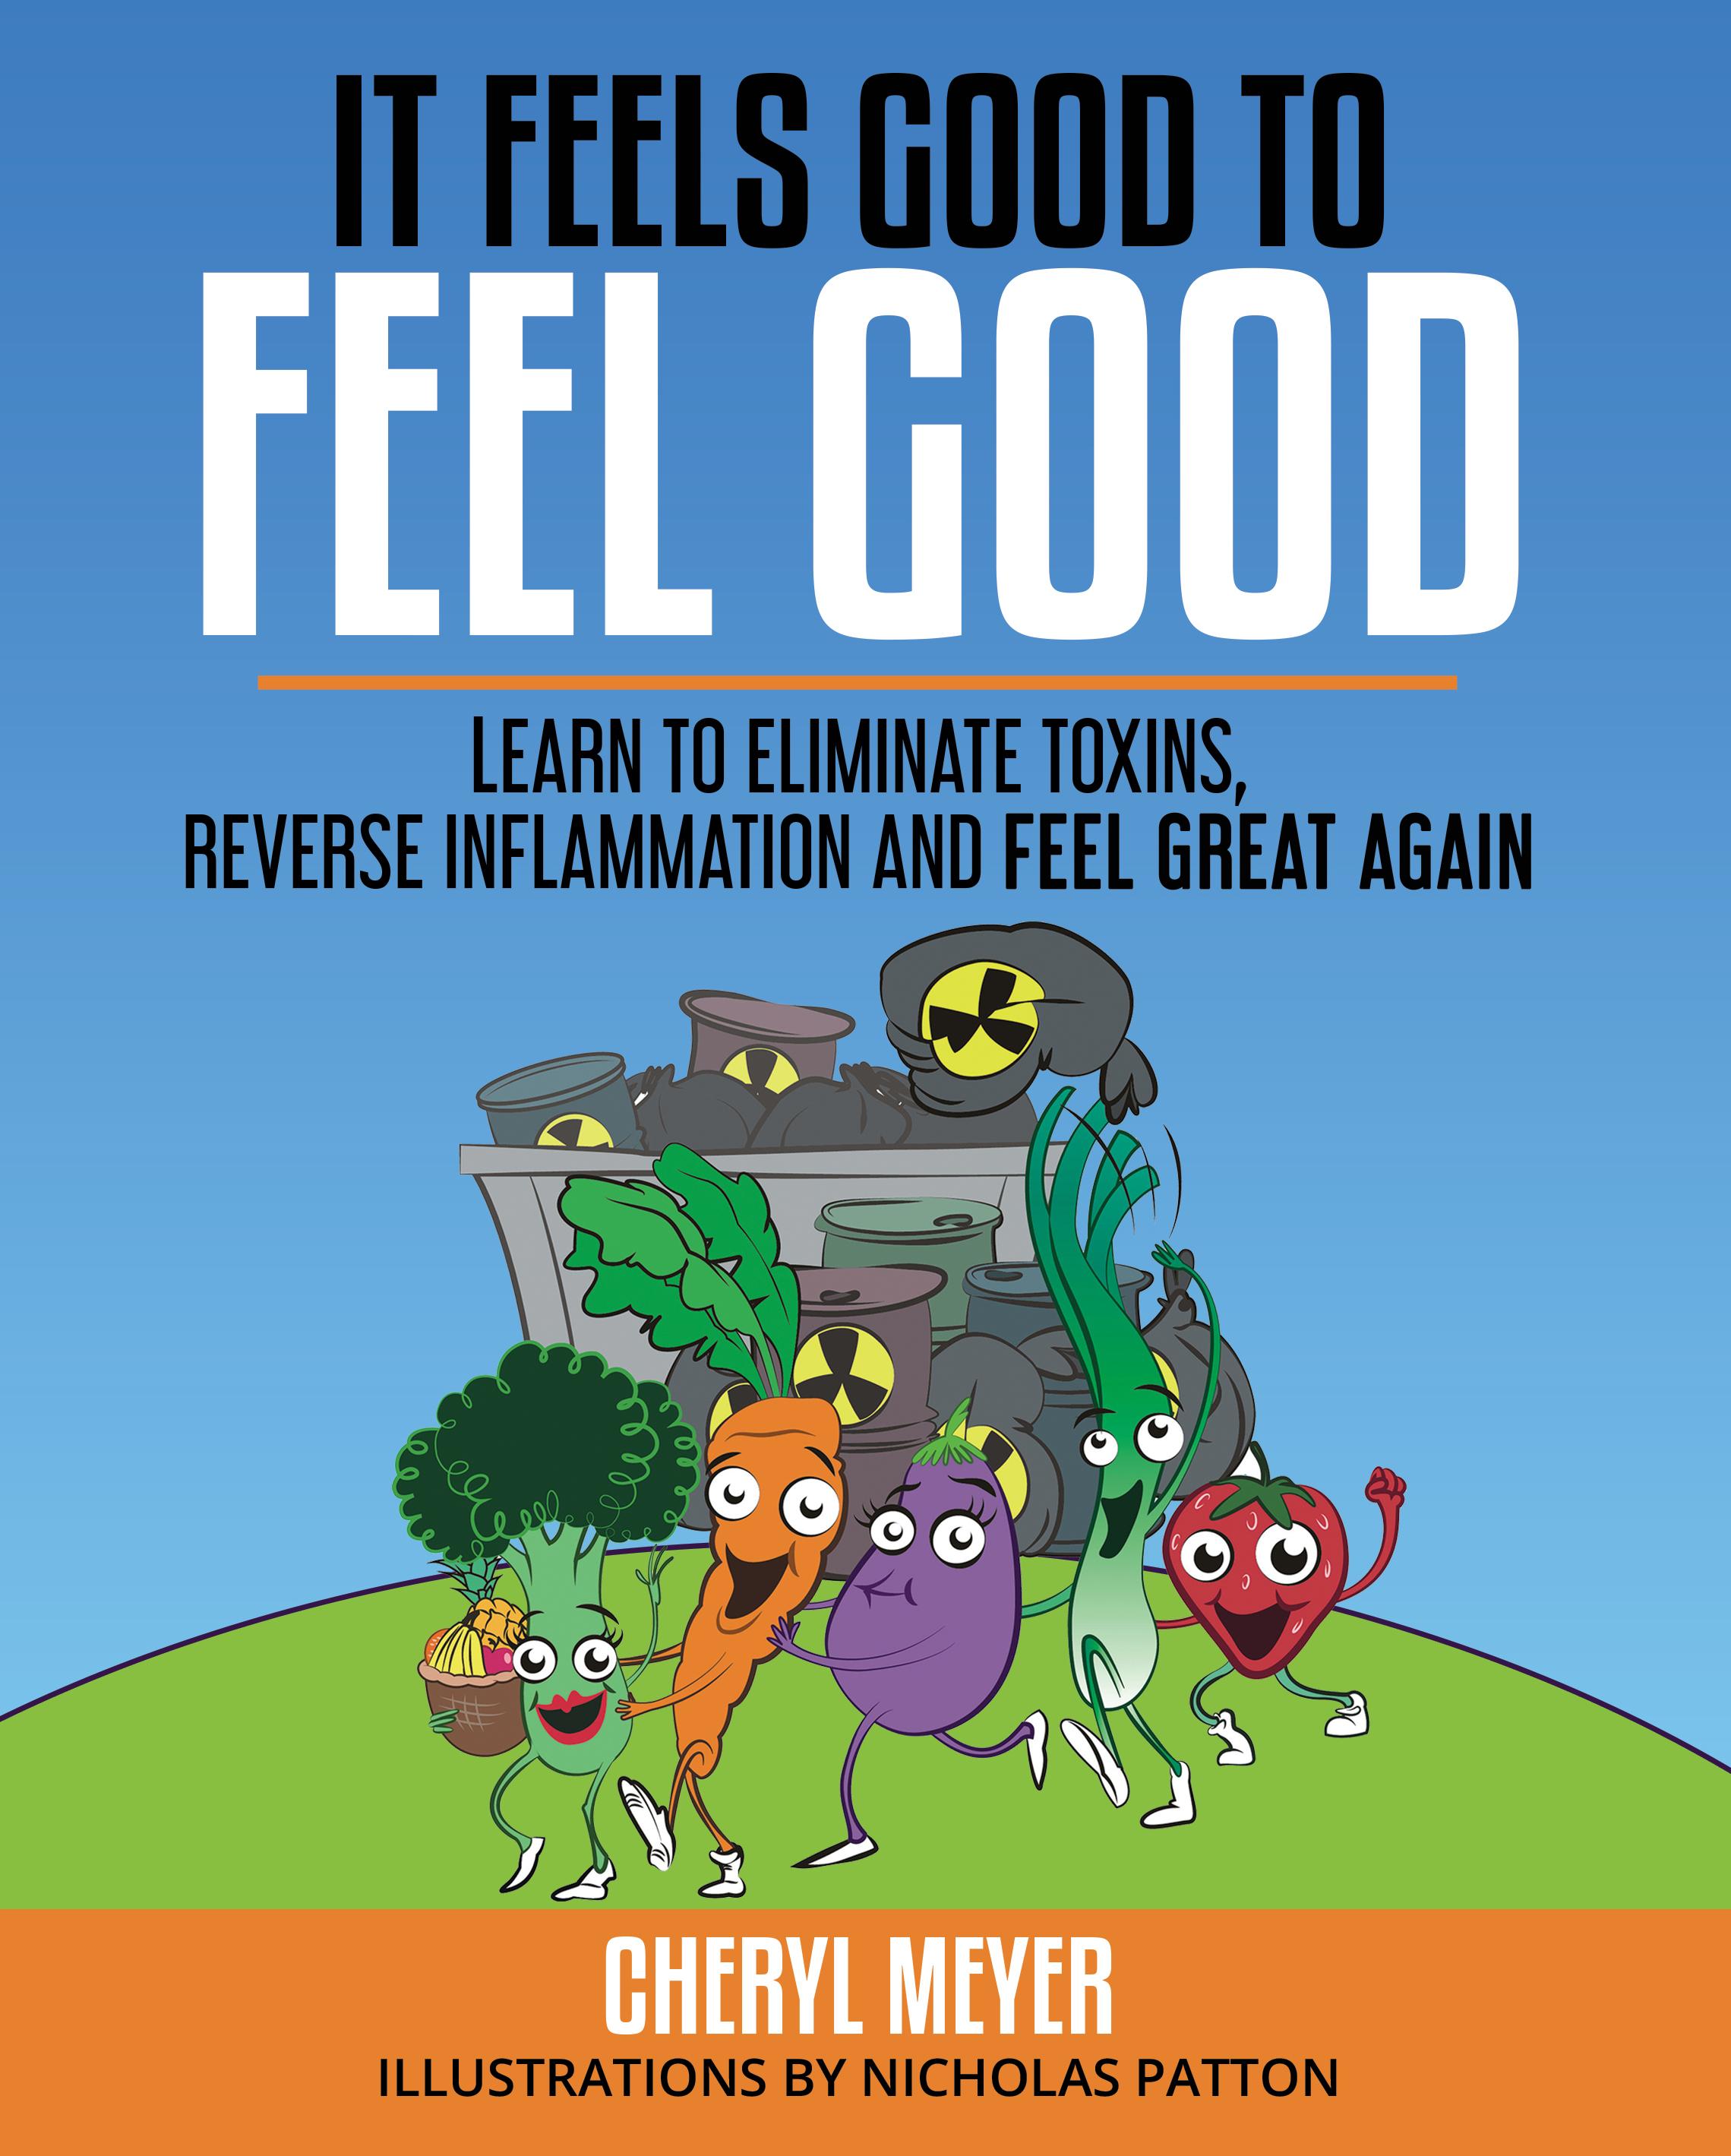 My Health M Muse Feels To Cheryl Good Feel It Book UMVjLSqzGp